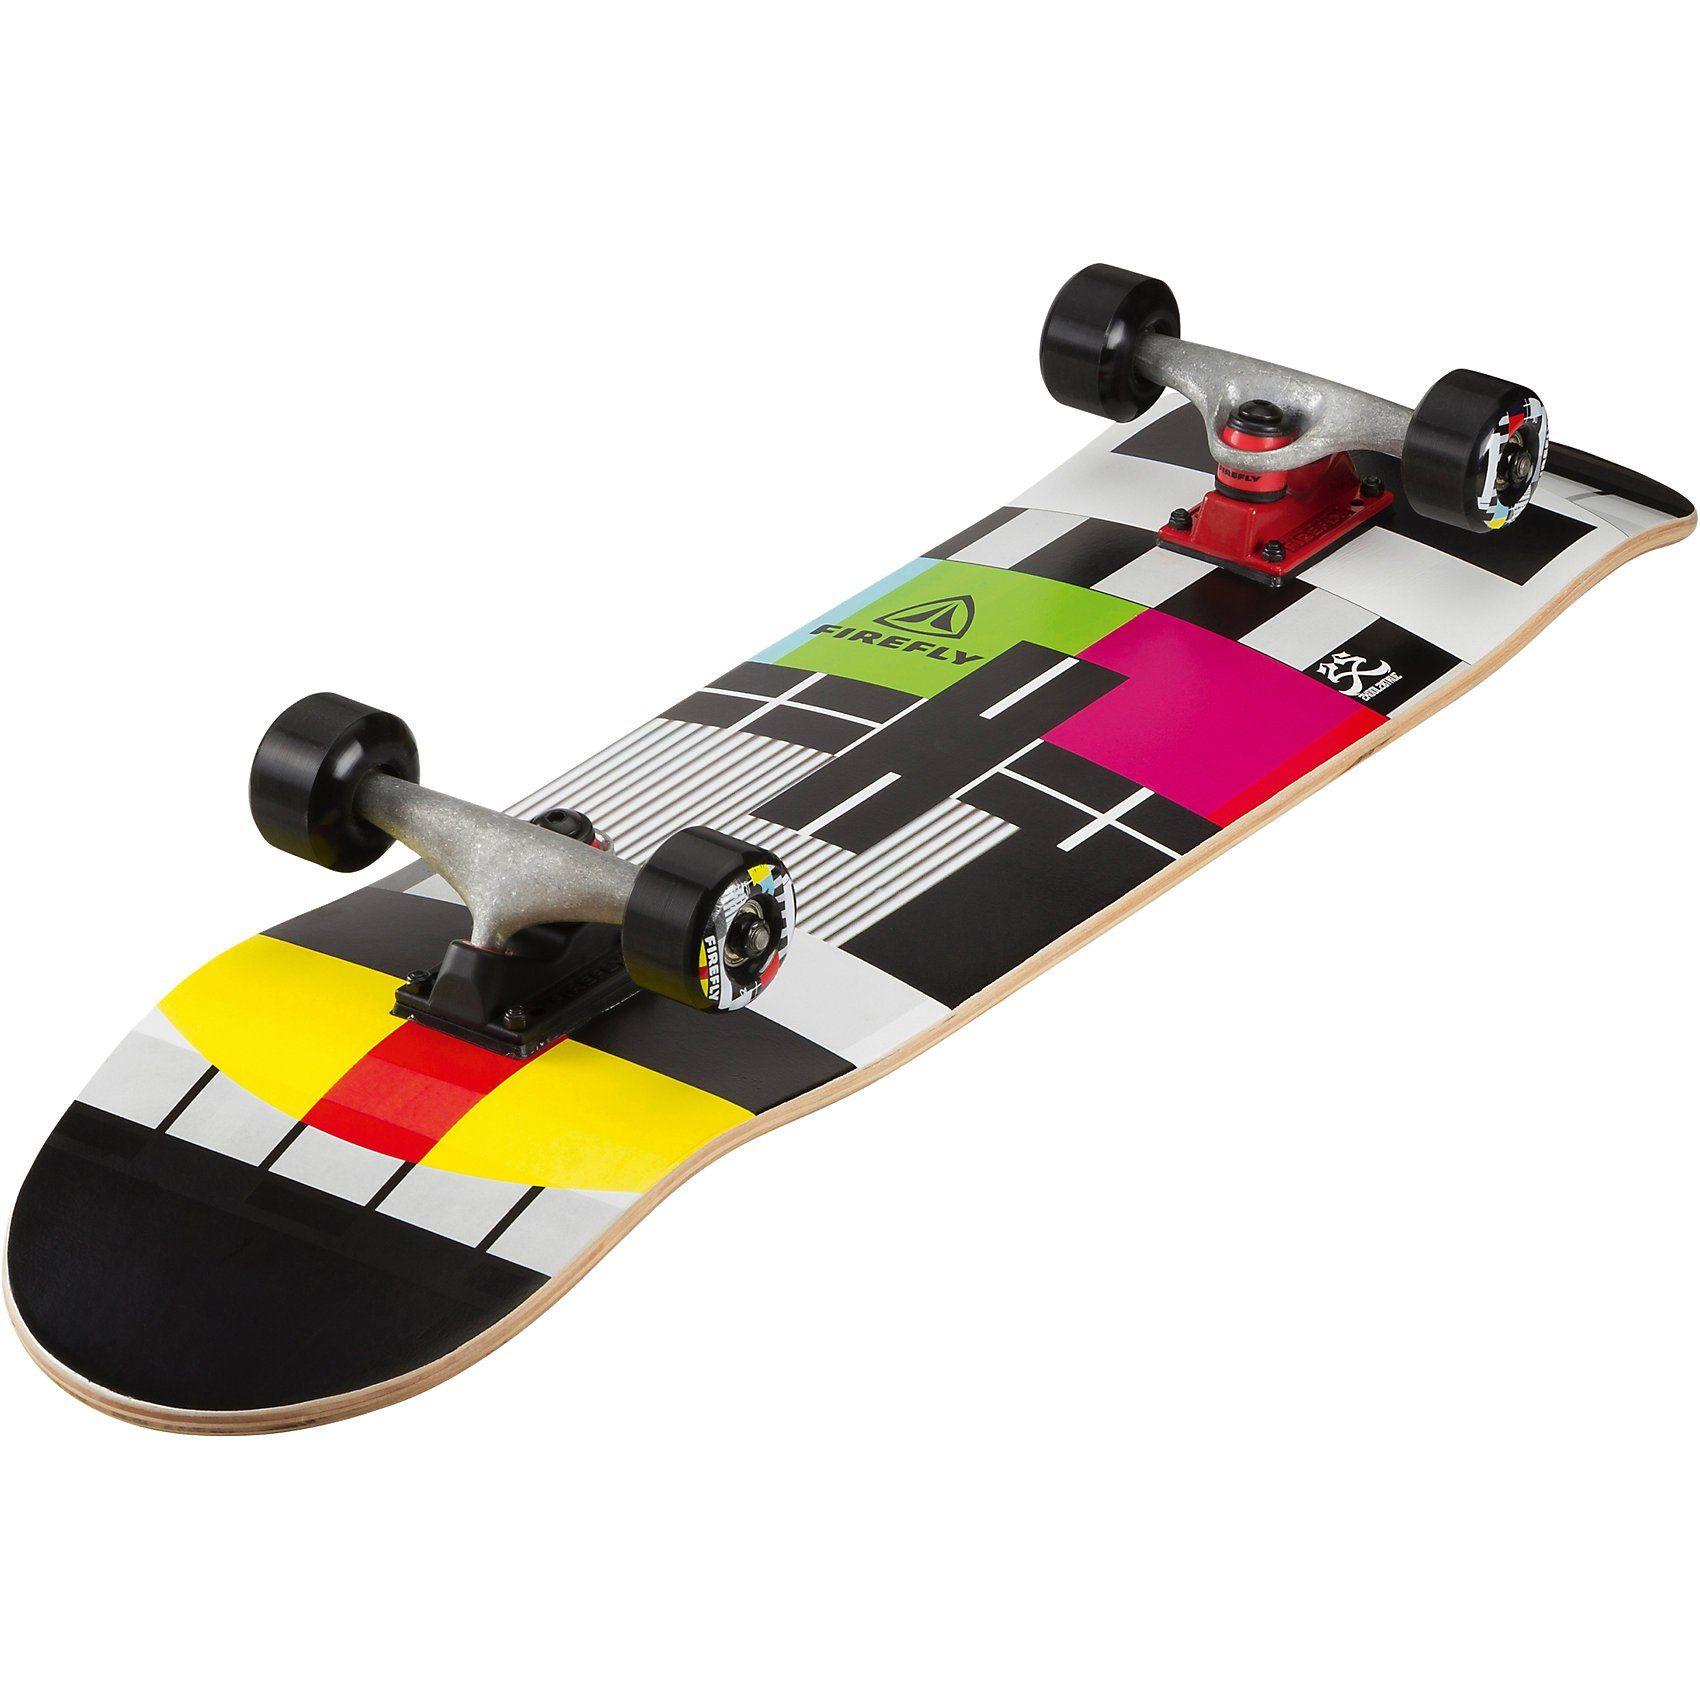 Firefly Skateboard Persicope